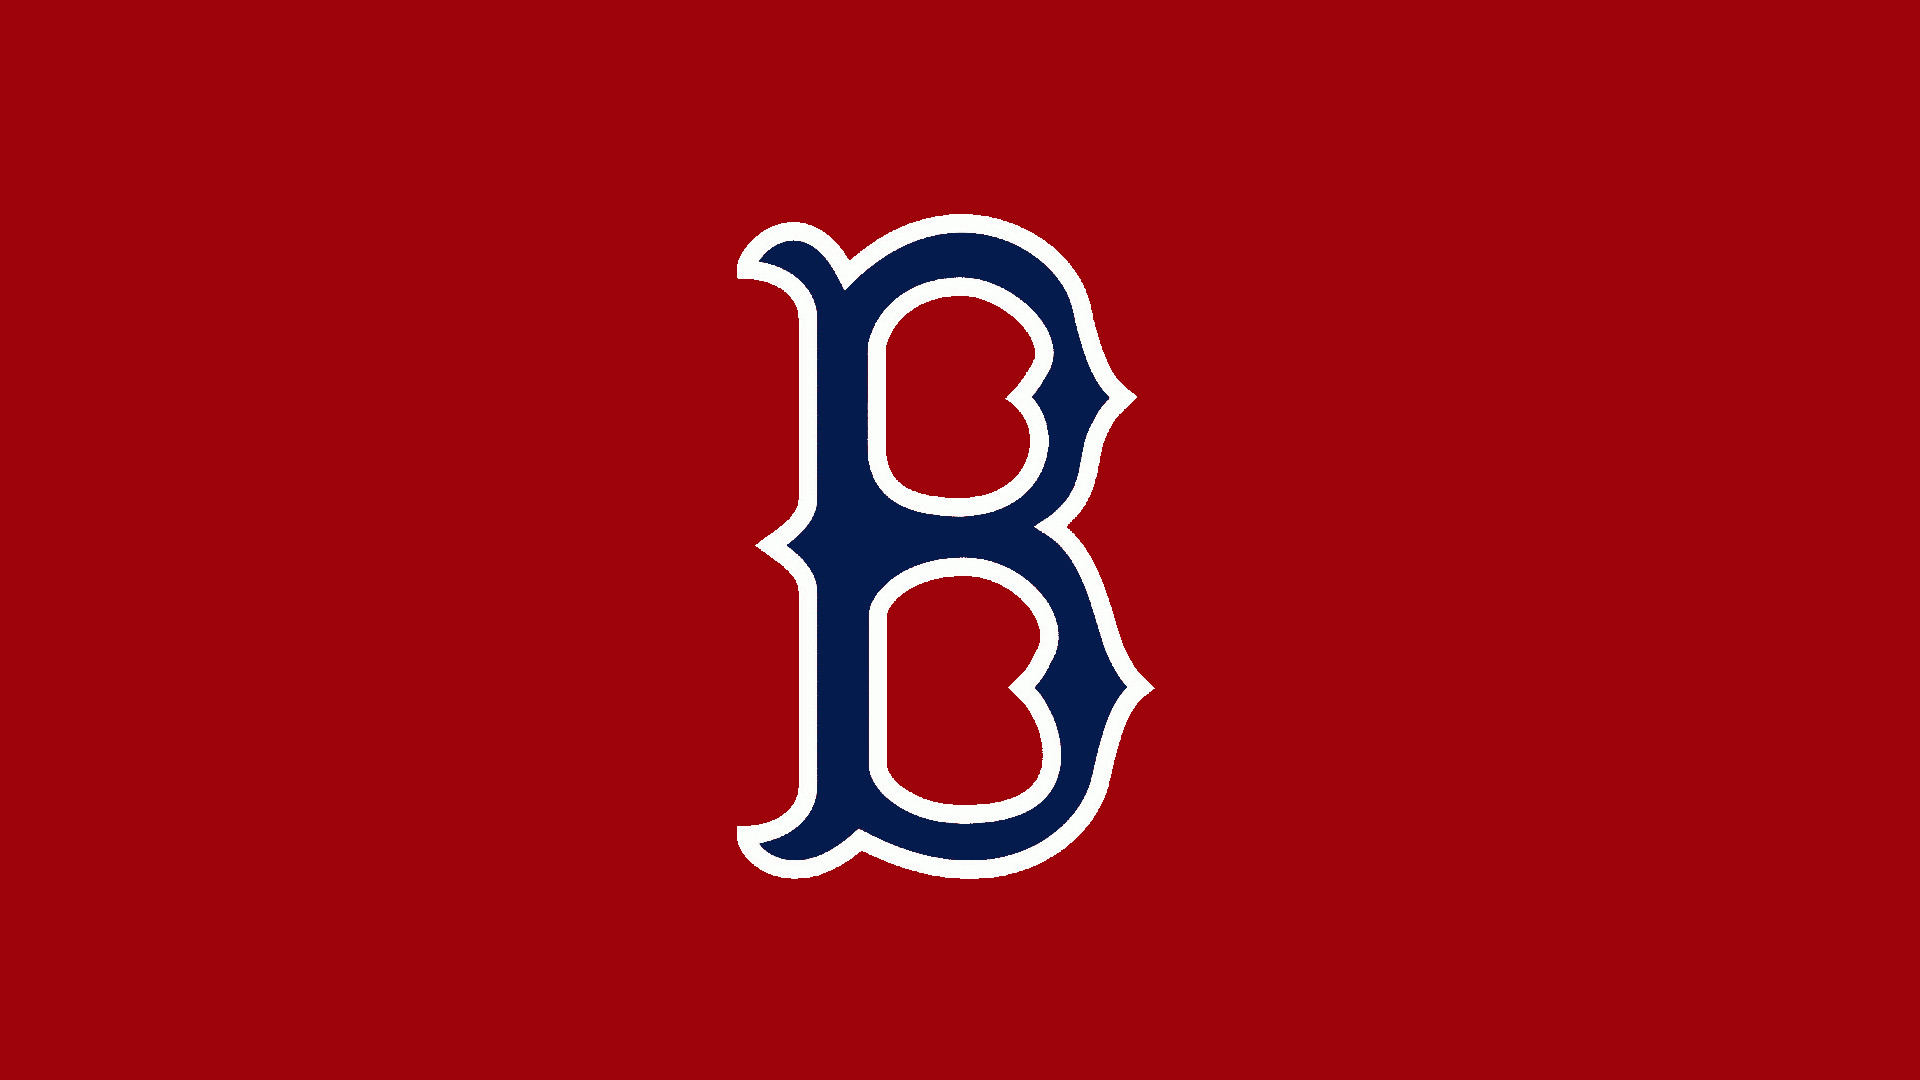 … boston red so hd wallpaper boston baseball team sport …